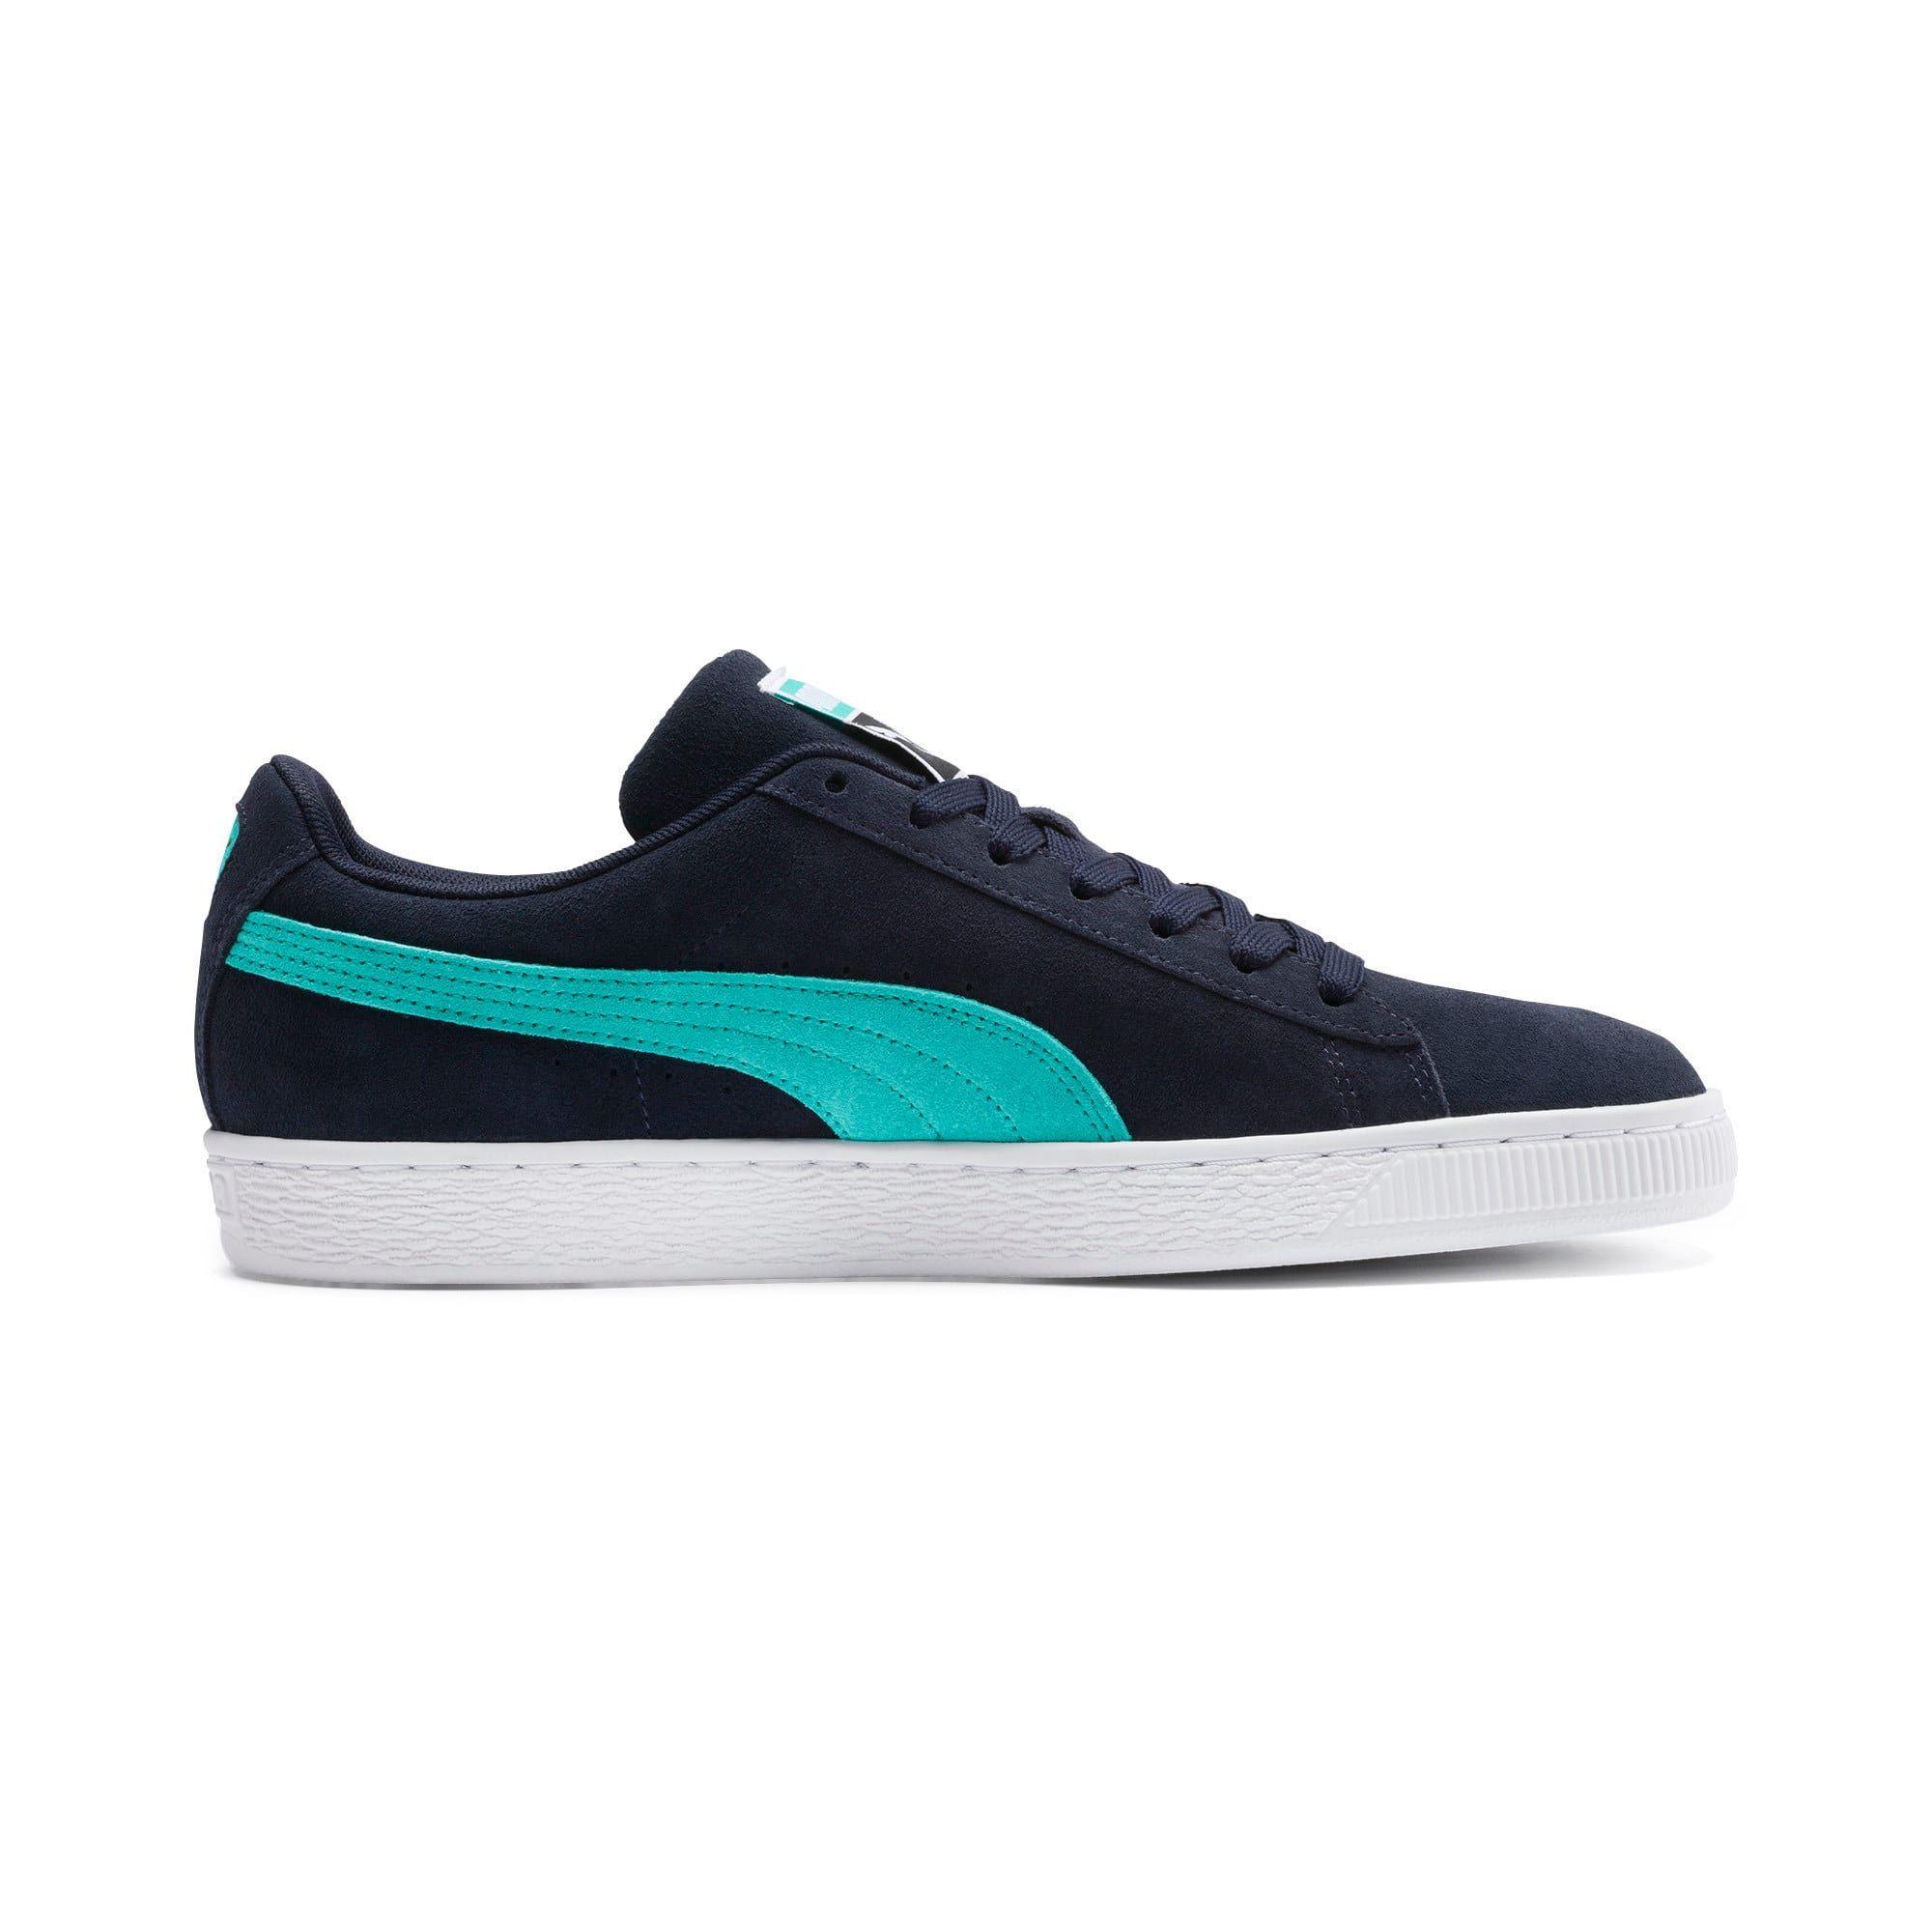 montar raro constante  PUMA Suede Classic Trainers in Peacoat/Blue Turquoise/White size 3.5 |  Chaussure puma, Chaussure sport, Chaussure